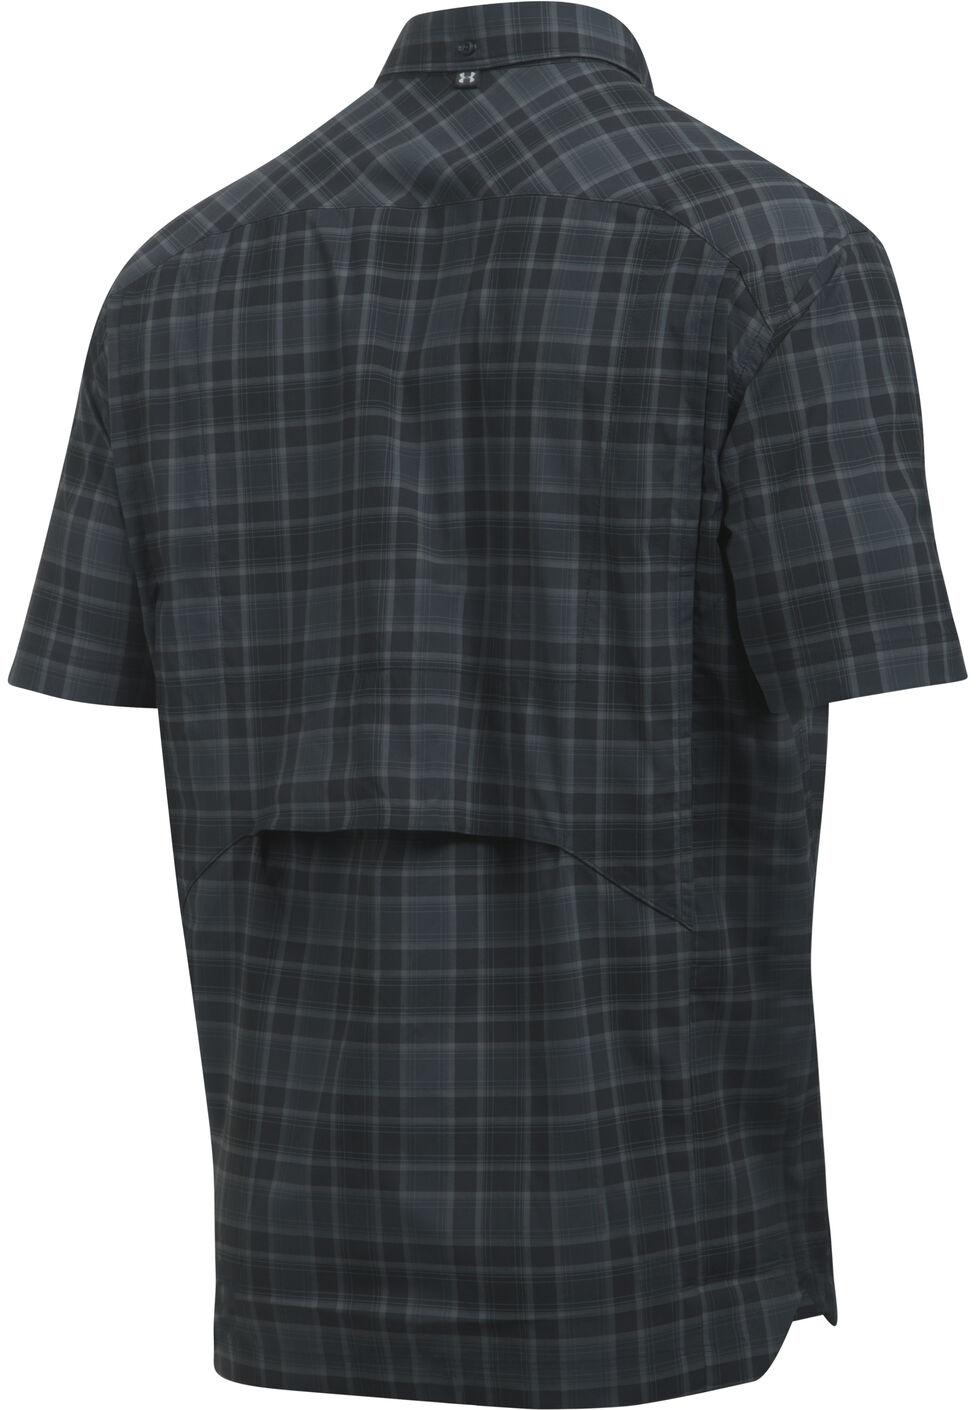 Under Armour Men's Charcoal Grey Fish Hunter Shirt, Charcoal Grey, hi-res